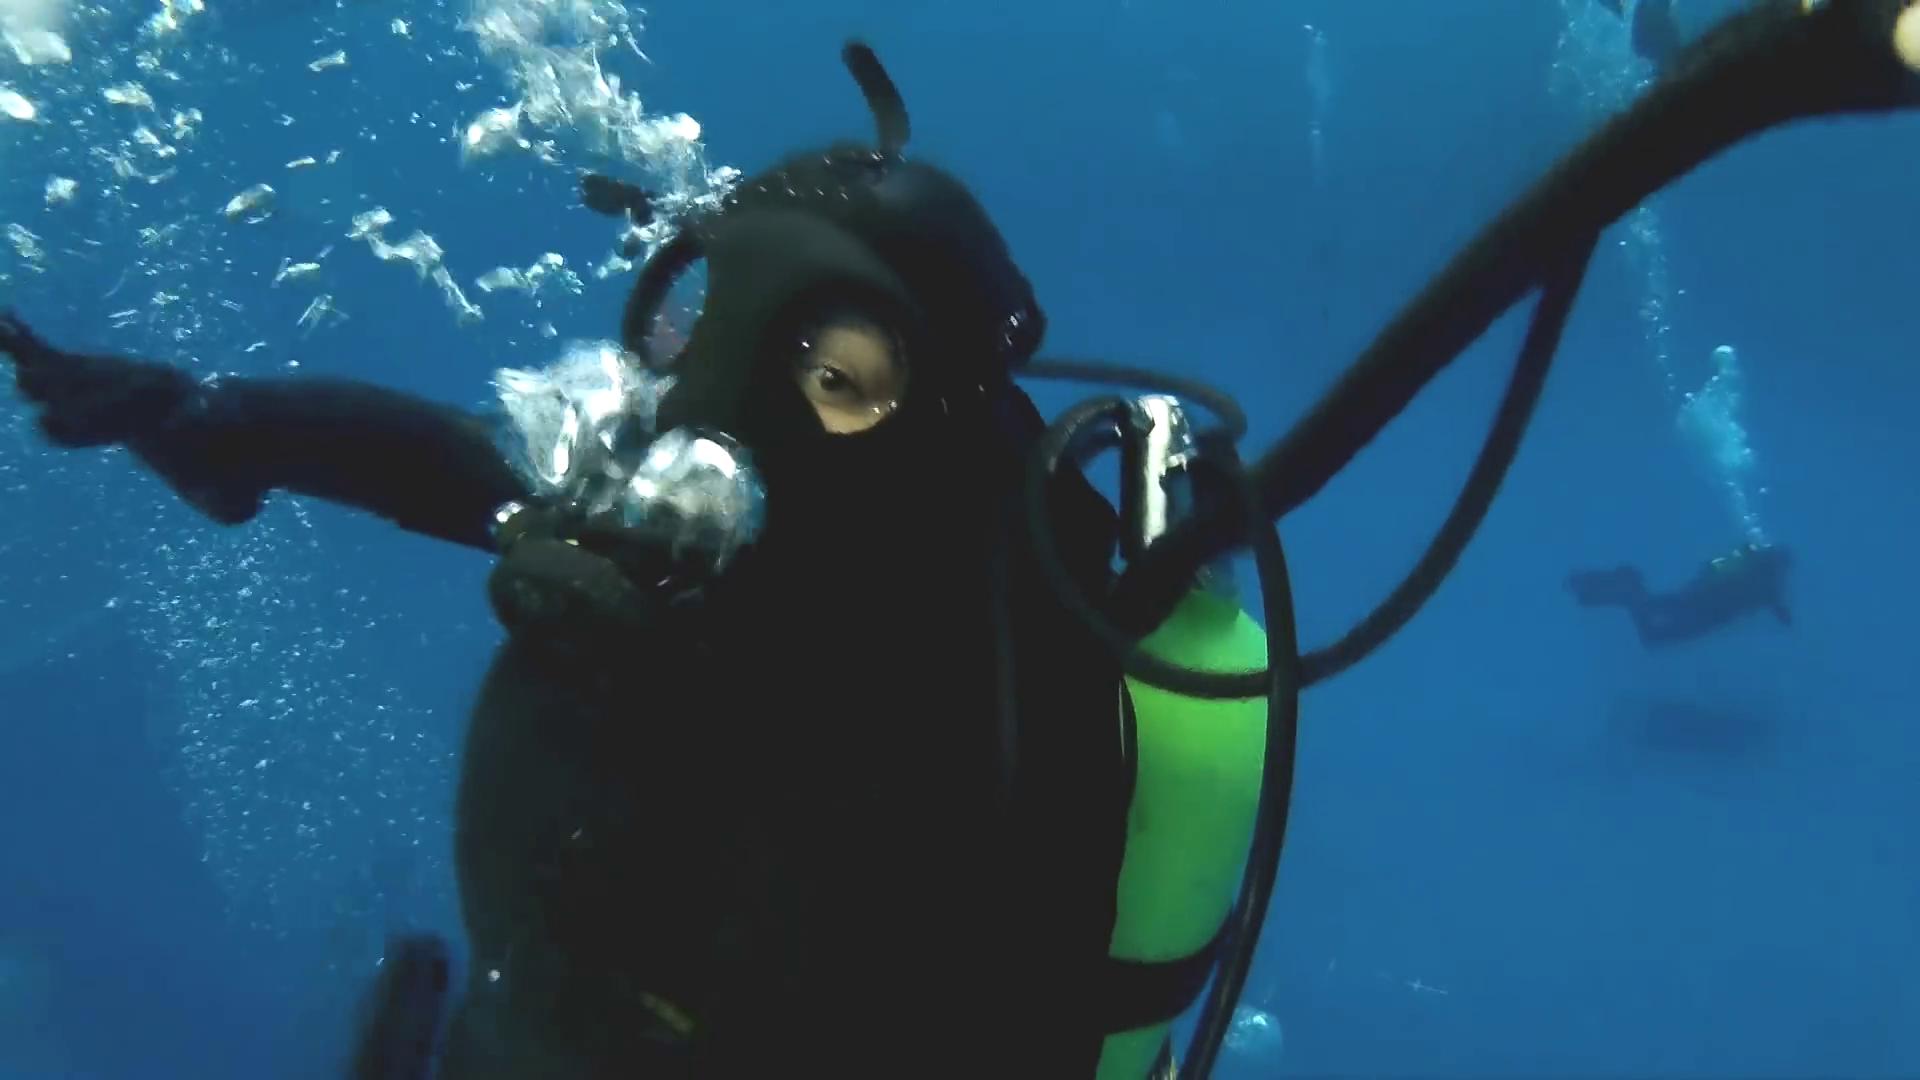 Underwater vintage woman think, that